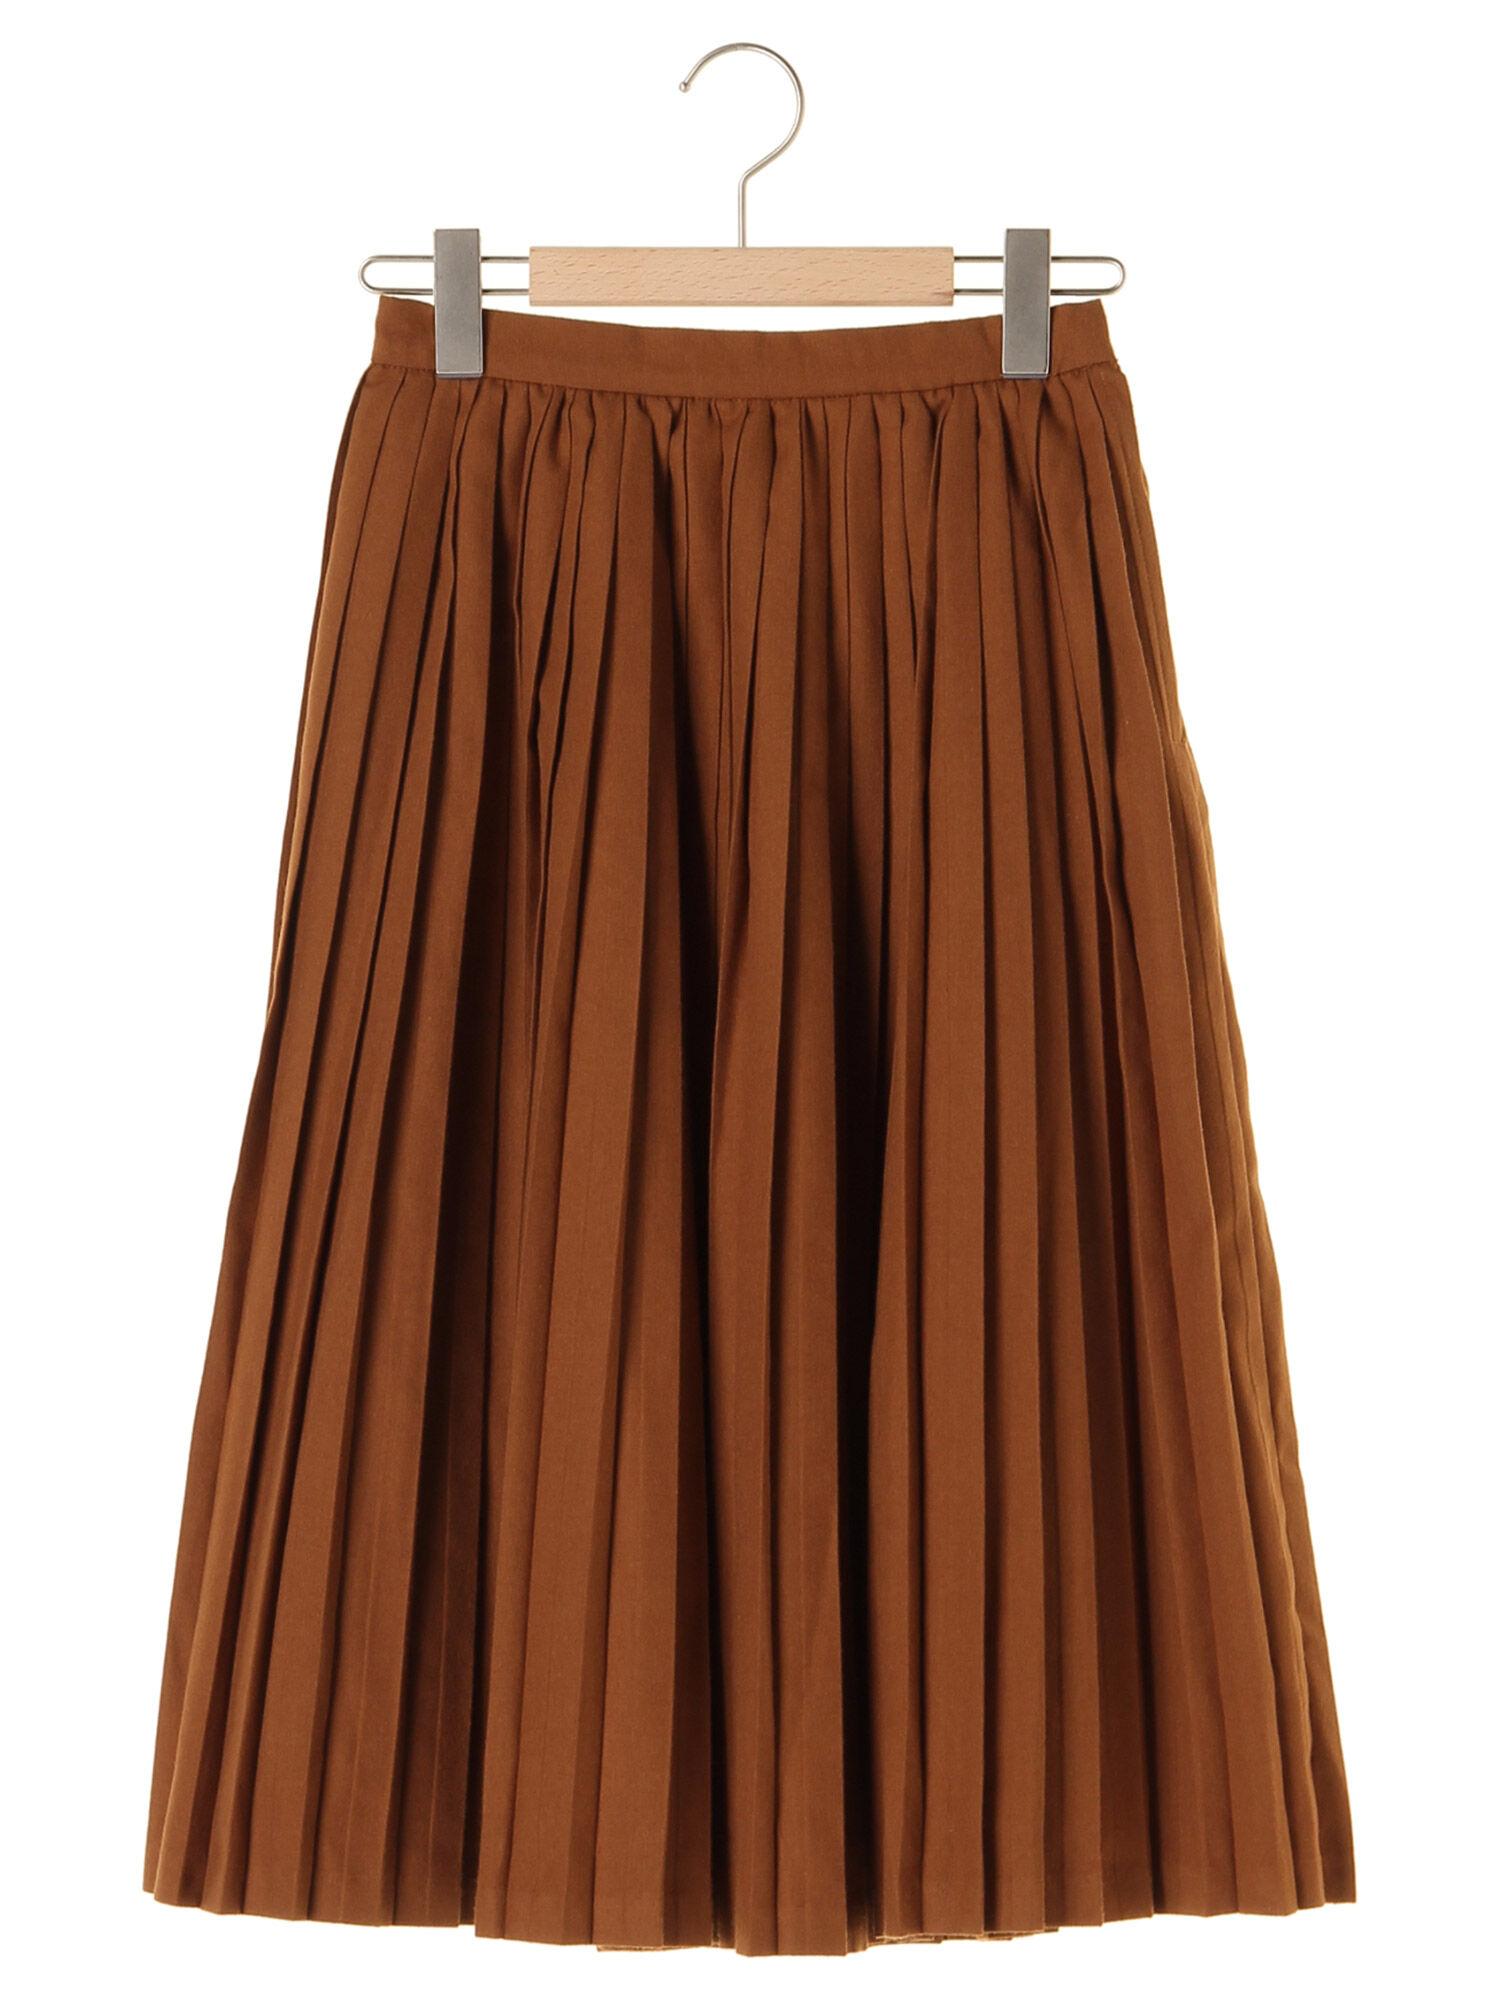 TRツイルプリーツスカート